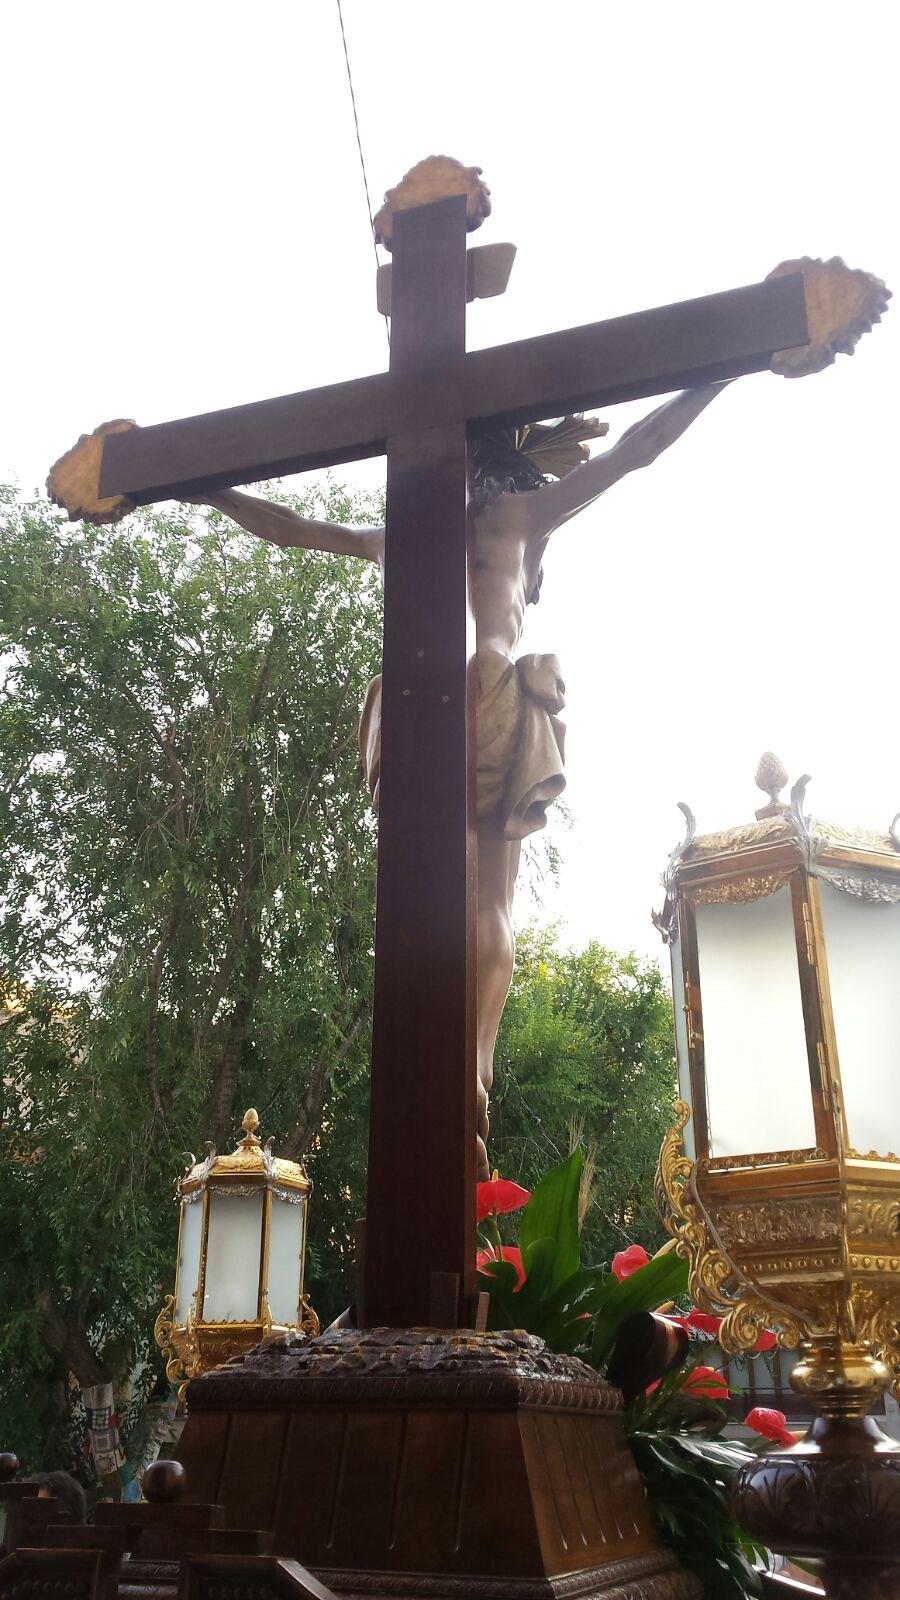 (2017-06-23) Vía Crucis de bajada - Manolo Miralles Romero (1)